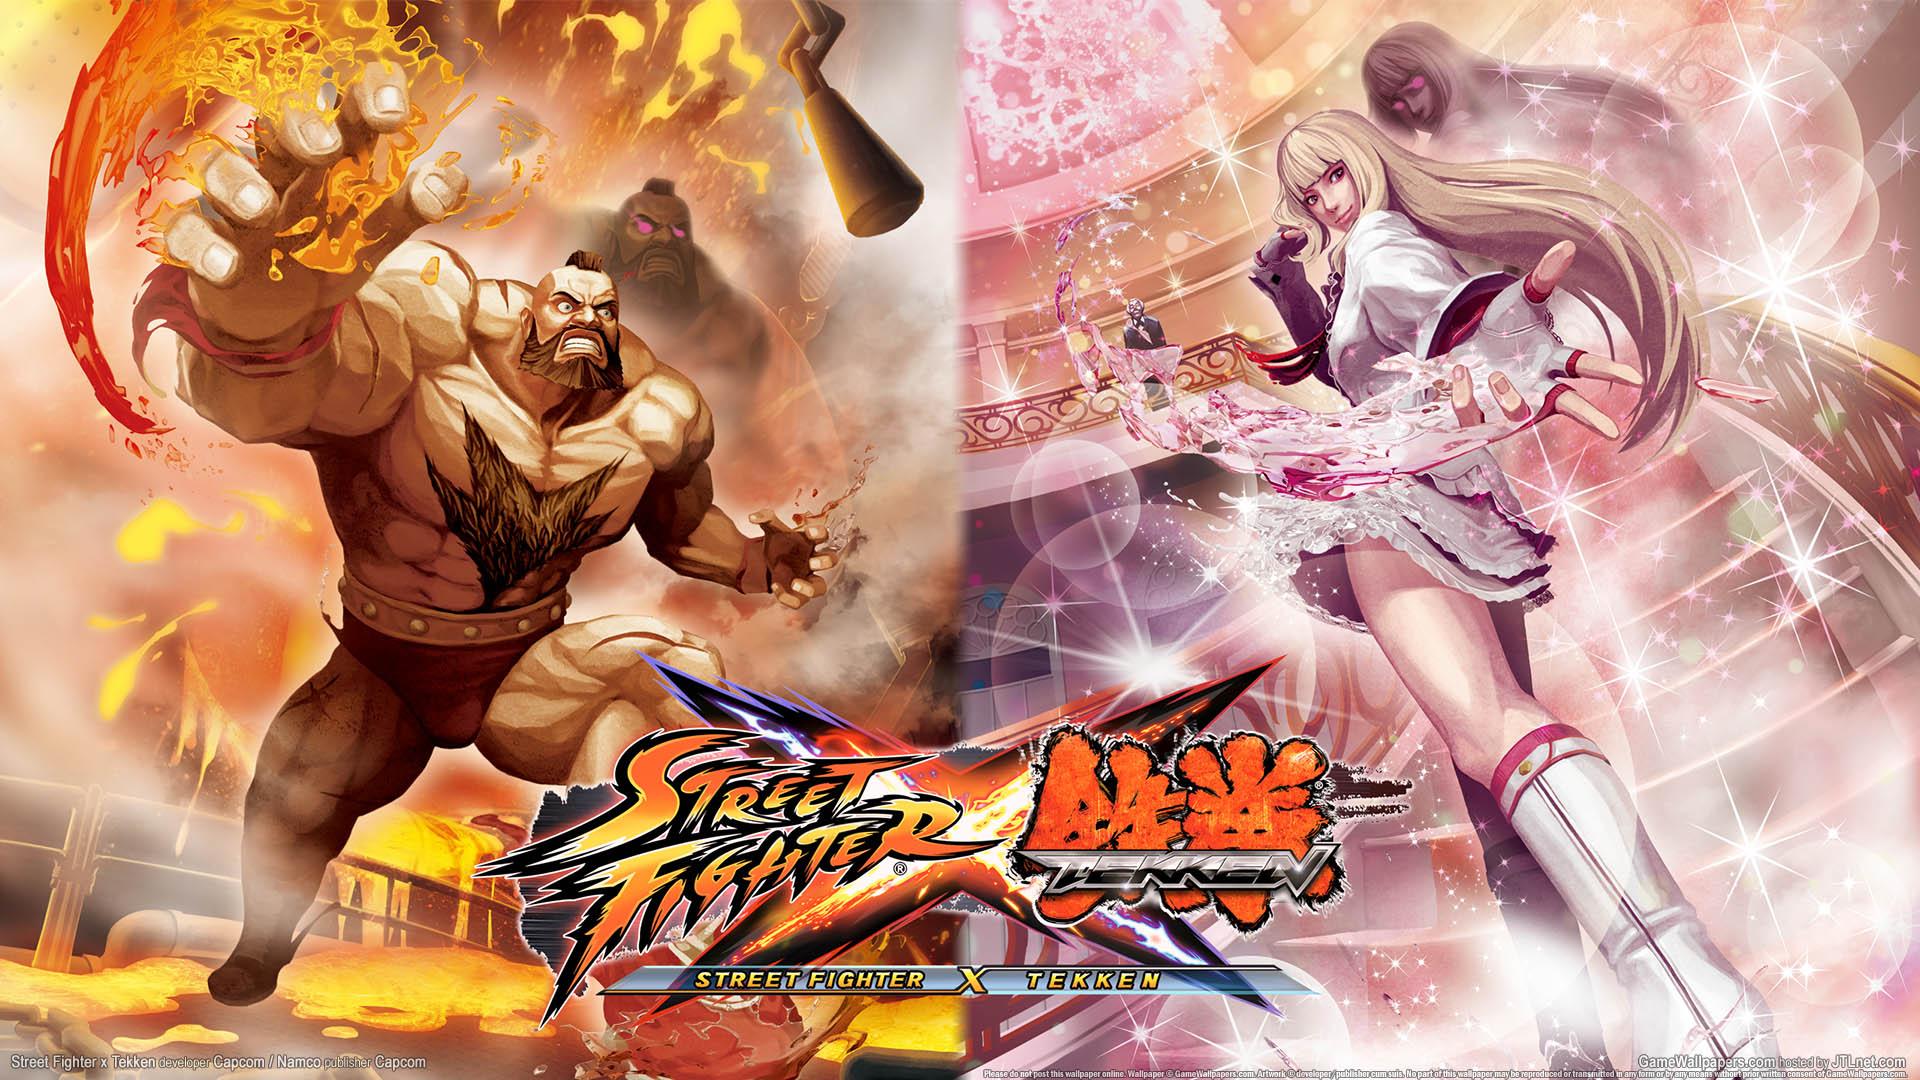 Street Fighter x Tekken wallpaper 02 1920x1080